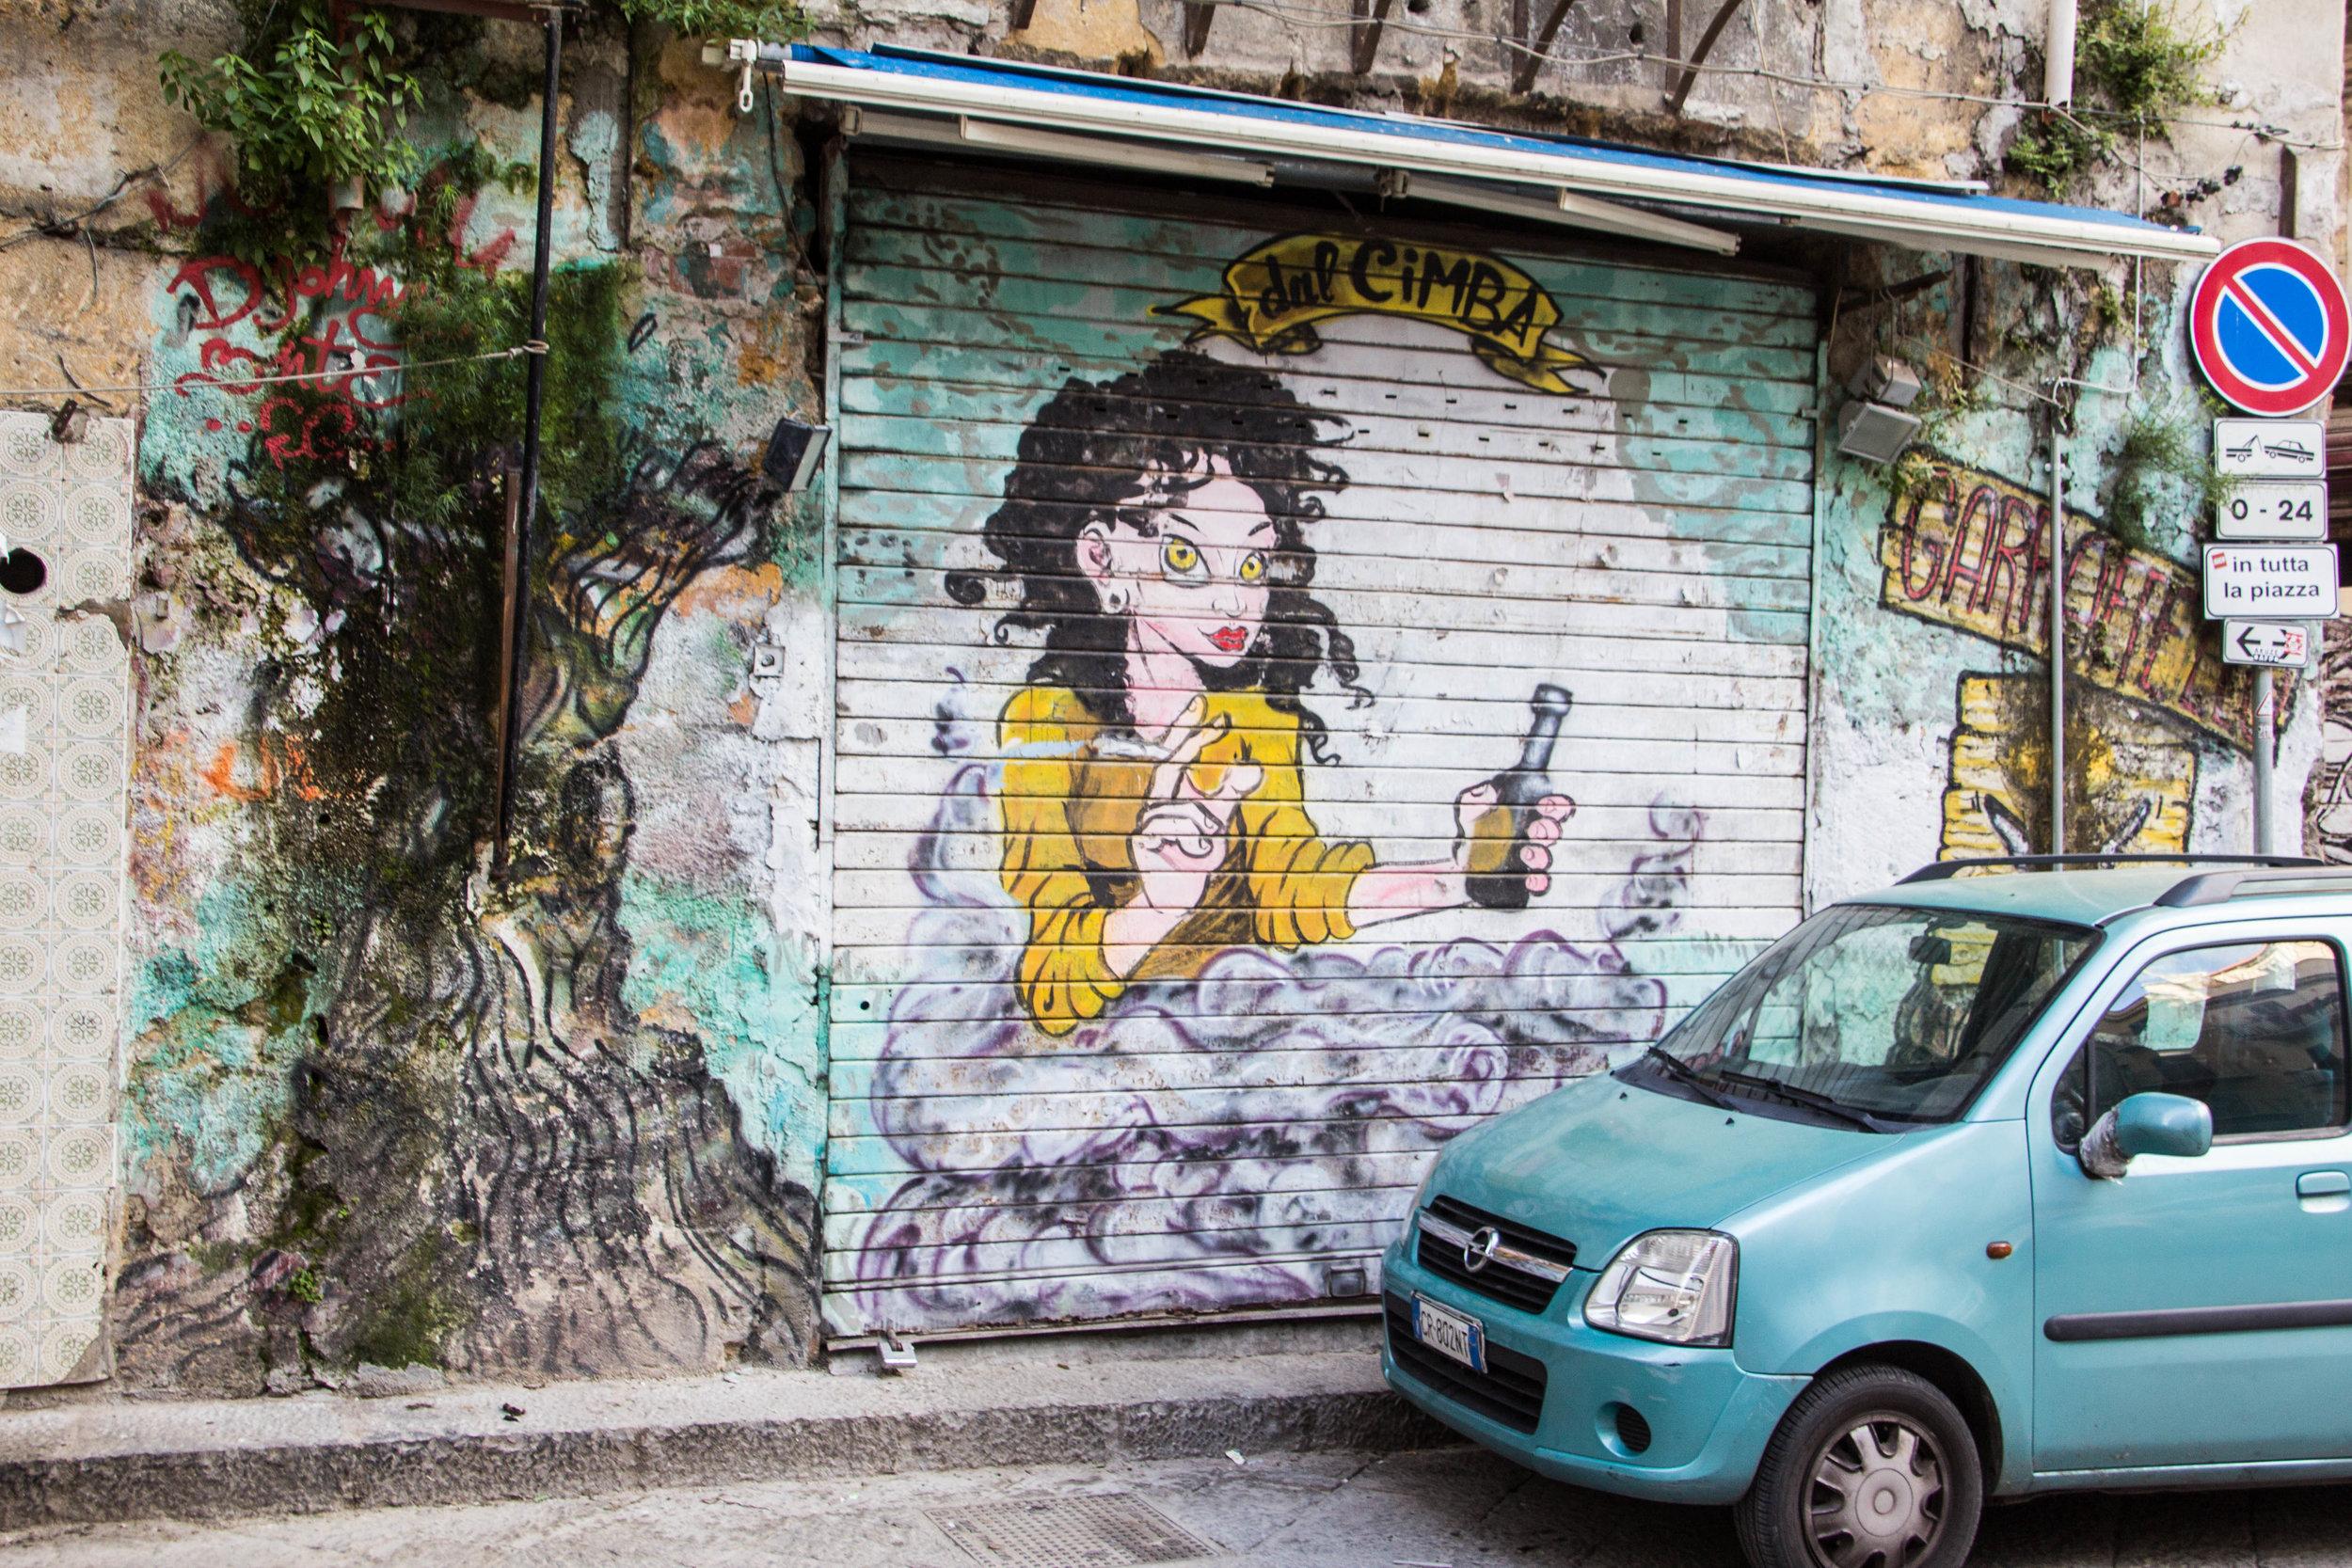 street-art-palermo-sicily-33.jpg